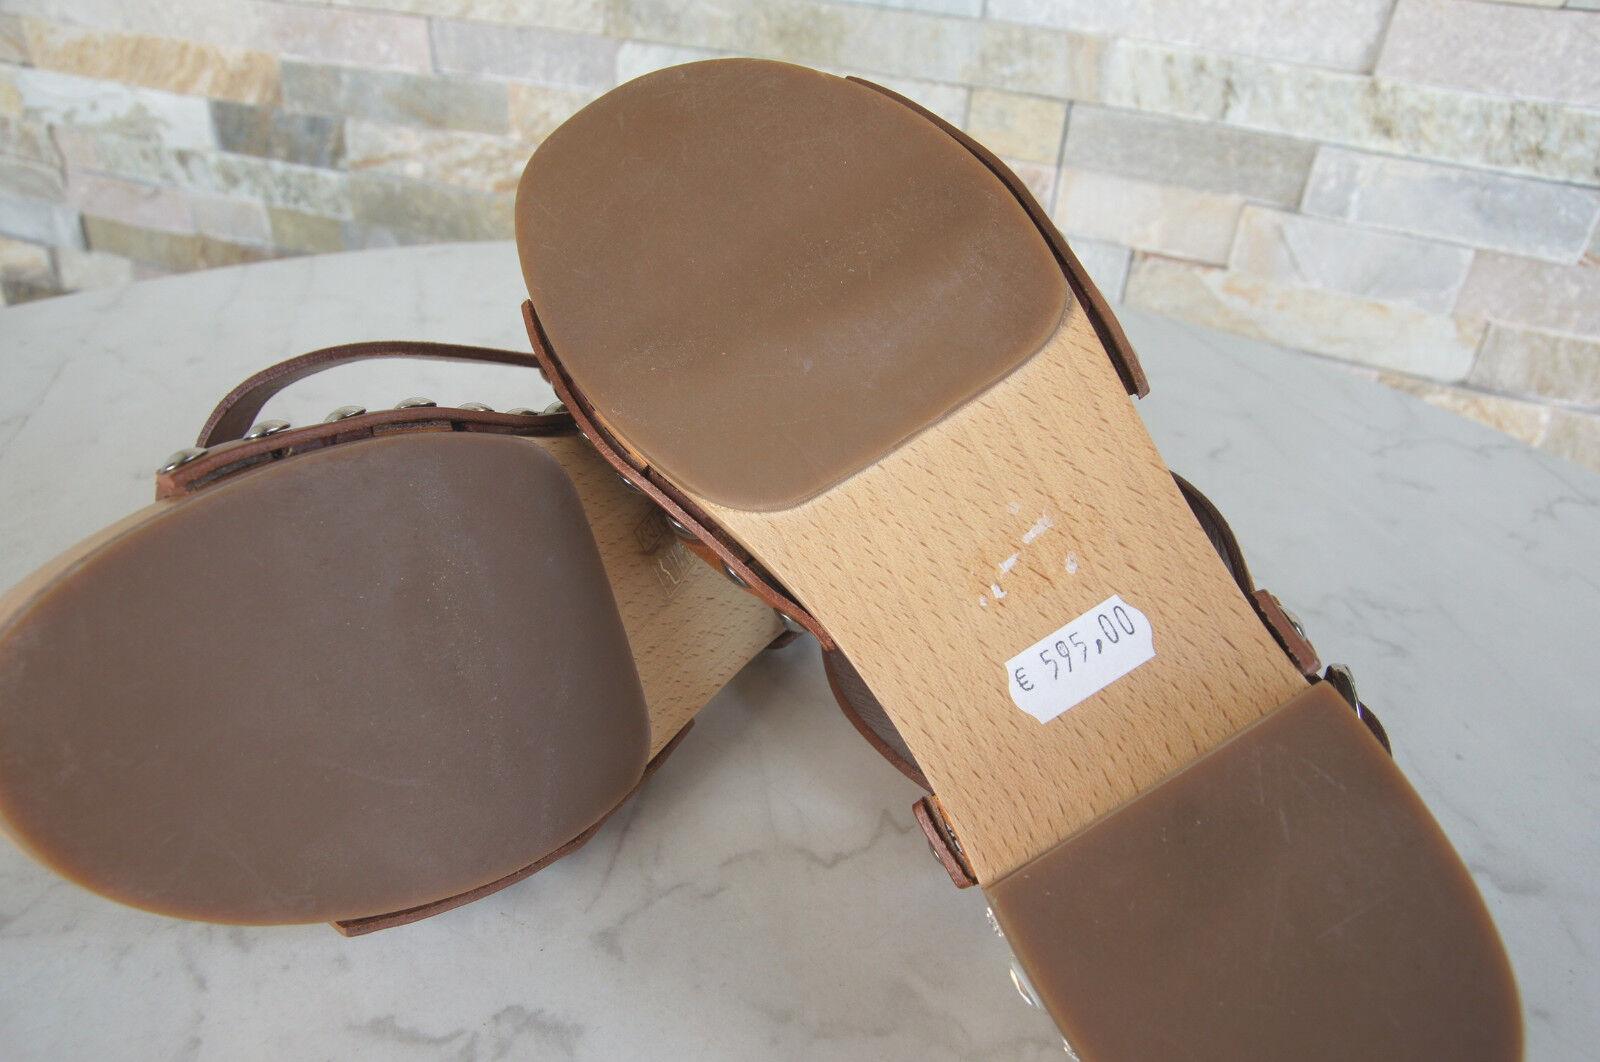 MIU MIU by Schuhe PRADA Gr 38 Sandalen Sandaletten Holz Schuhe by braun neu 682678